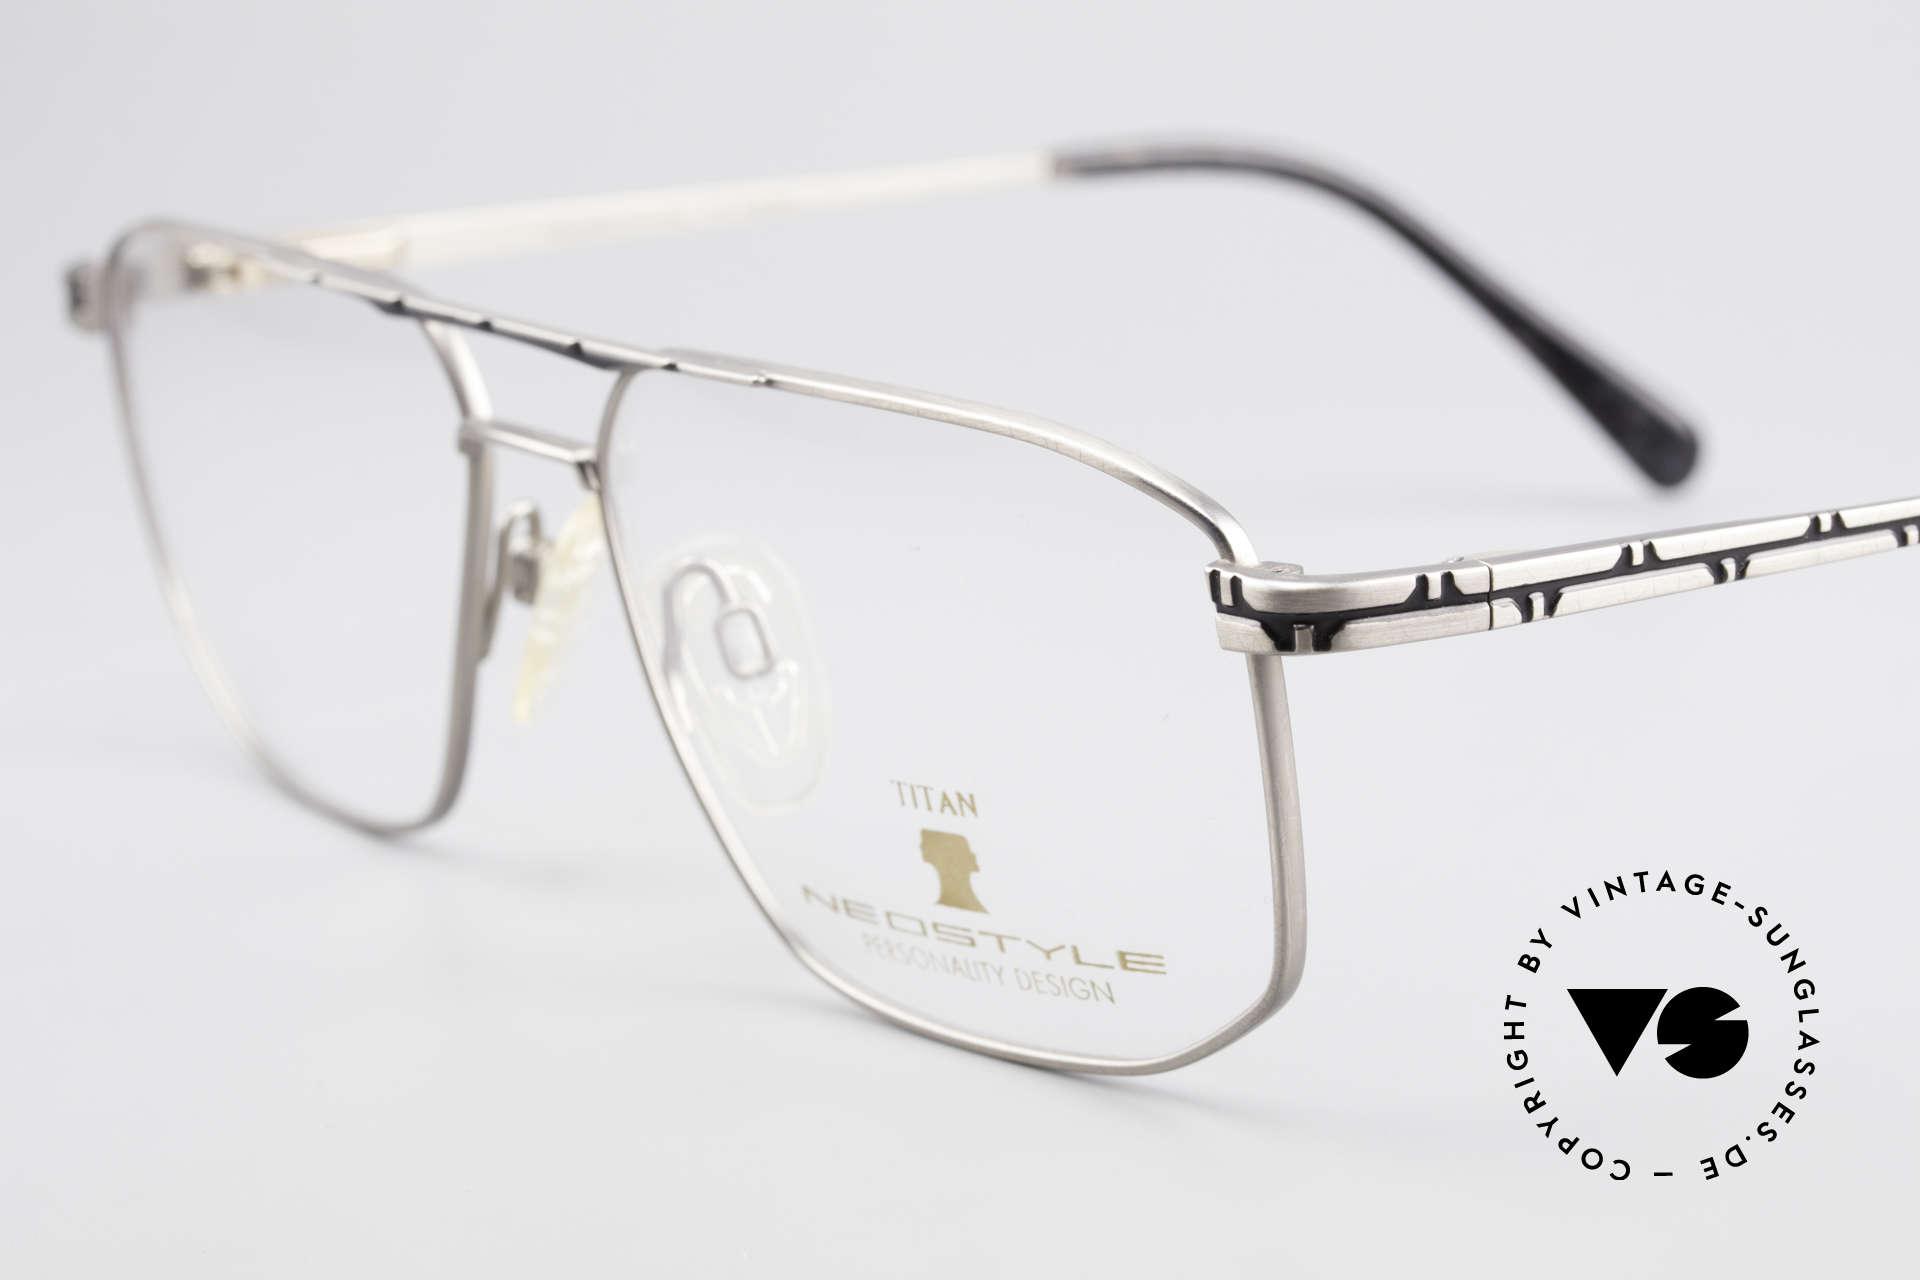 Neostyle Dynasty 362 XL Titanium Eyeglasses Men, never worn (like all our rare vintage eyeglasses), Made for Men